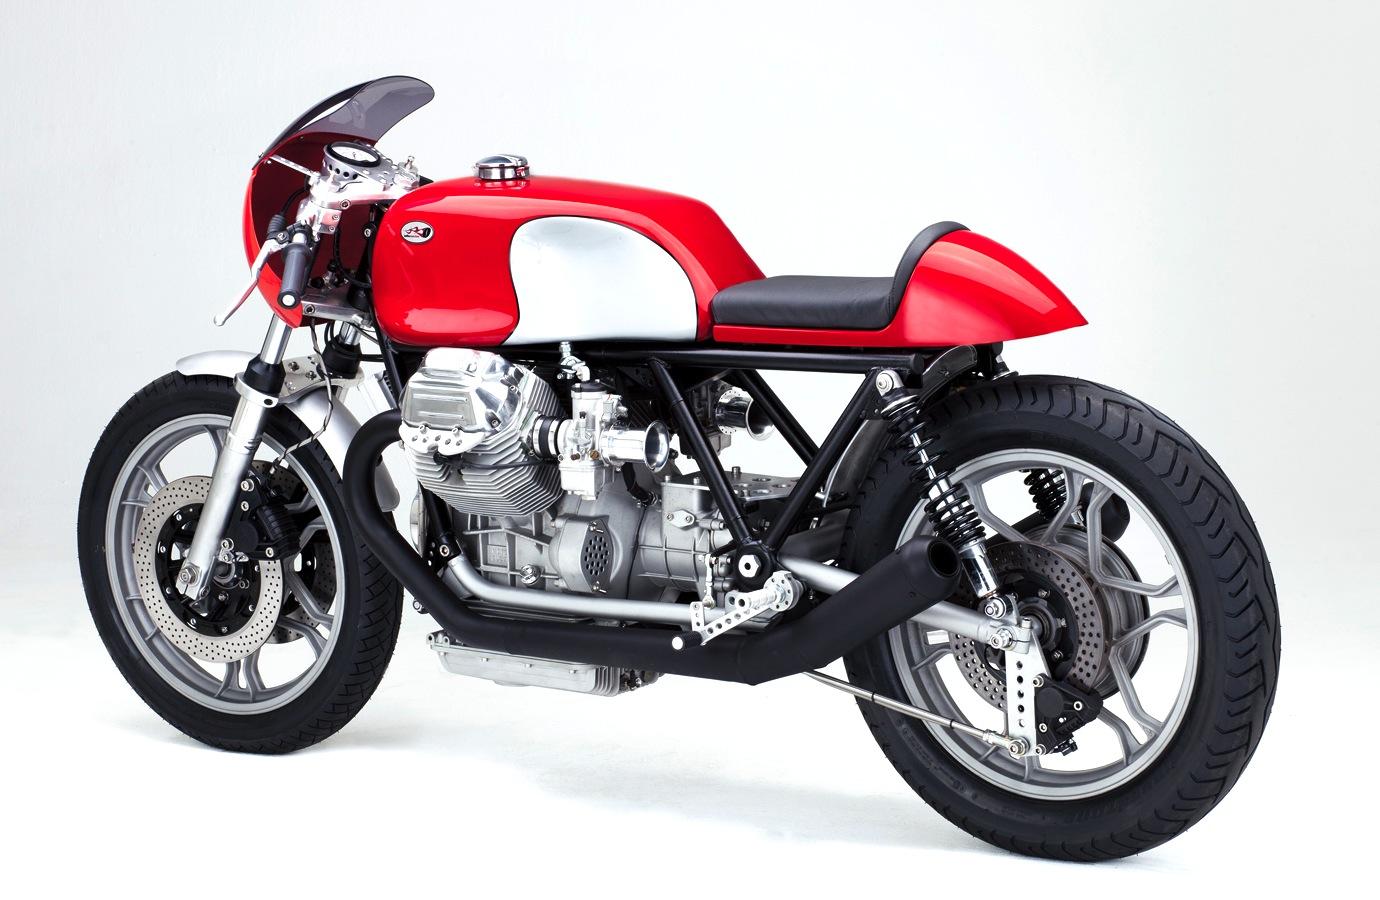 milchapitas kustom bikes moto guzzi by kaffe maschine. Black Bedroom Furniture Sets. Home Design Ideas